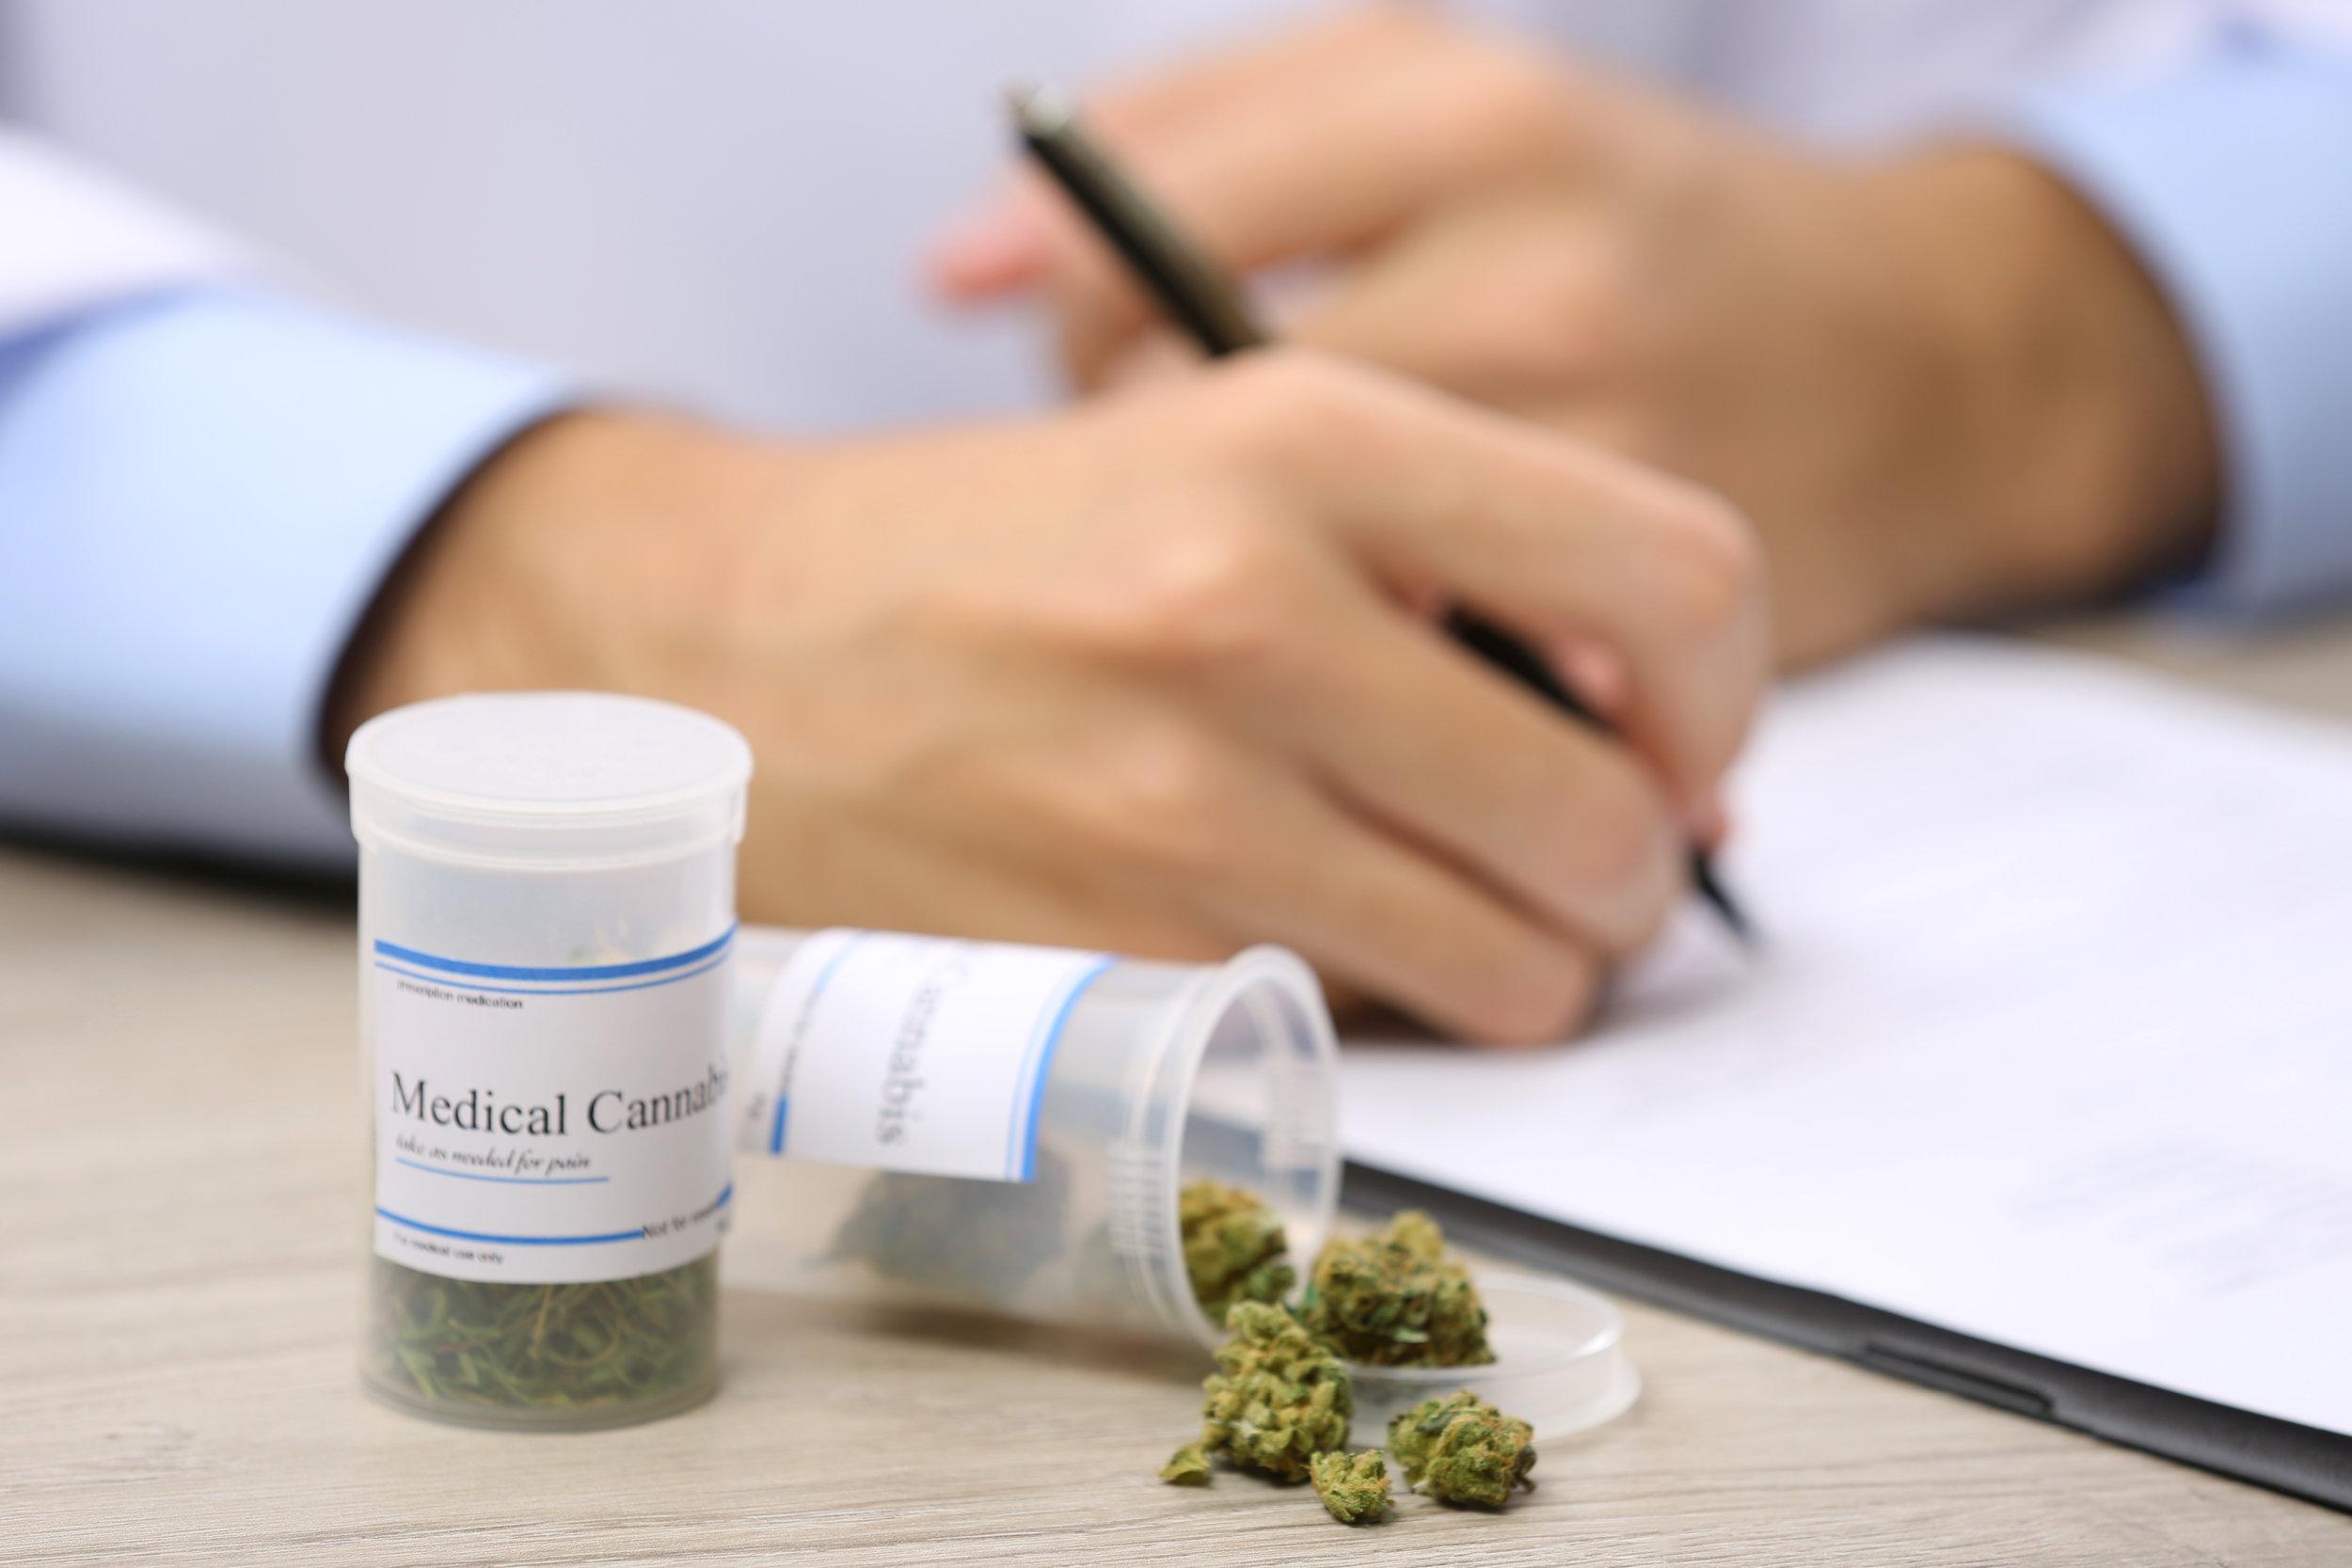 cannabis-marijuana-hemp-prescription_94181814.jpeg